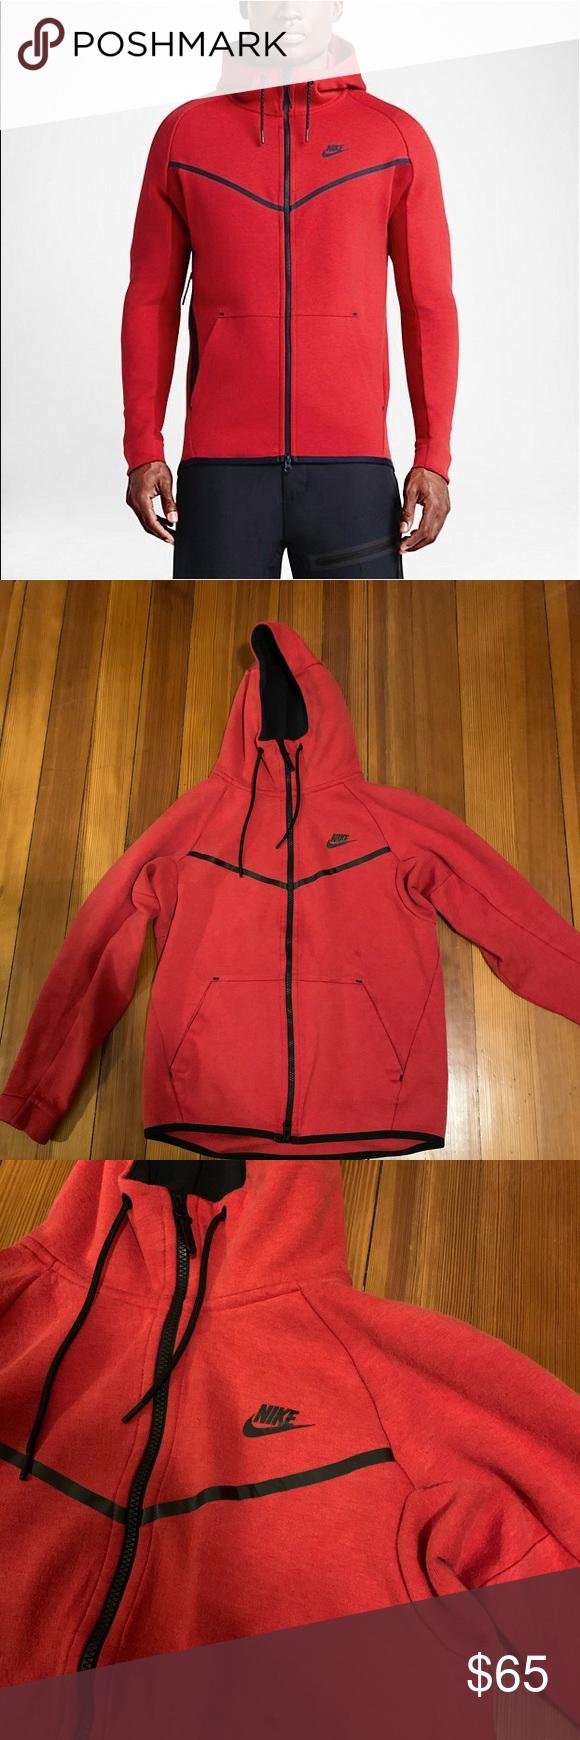 NIKE Tech Fleece Hoodie University Red. Size S Nike tech